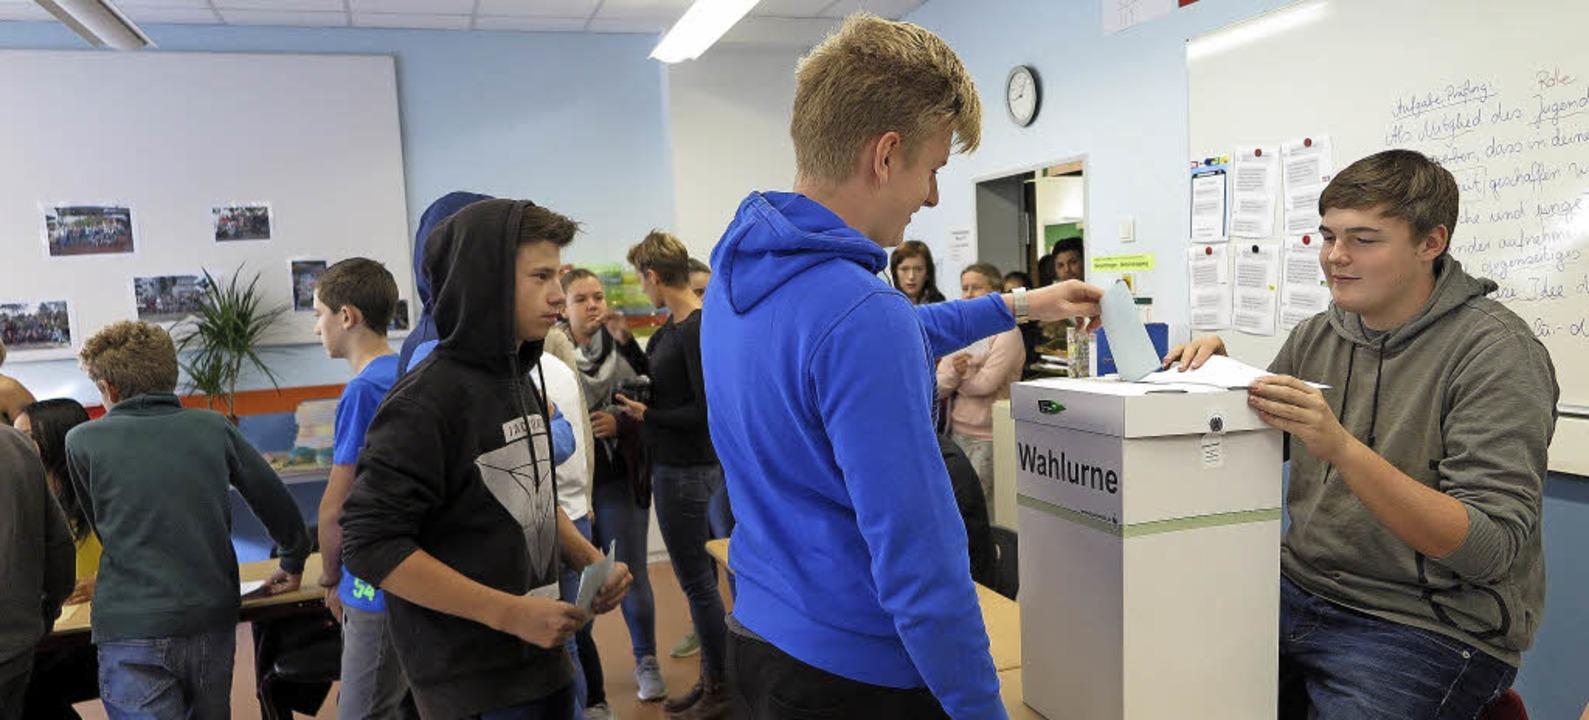 Wählen wie die Großen: Juniorwahl in der Schliengener Hebelschule  | Foto: Dorothee Philipp